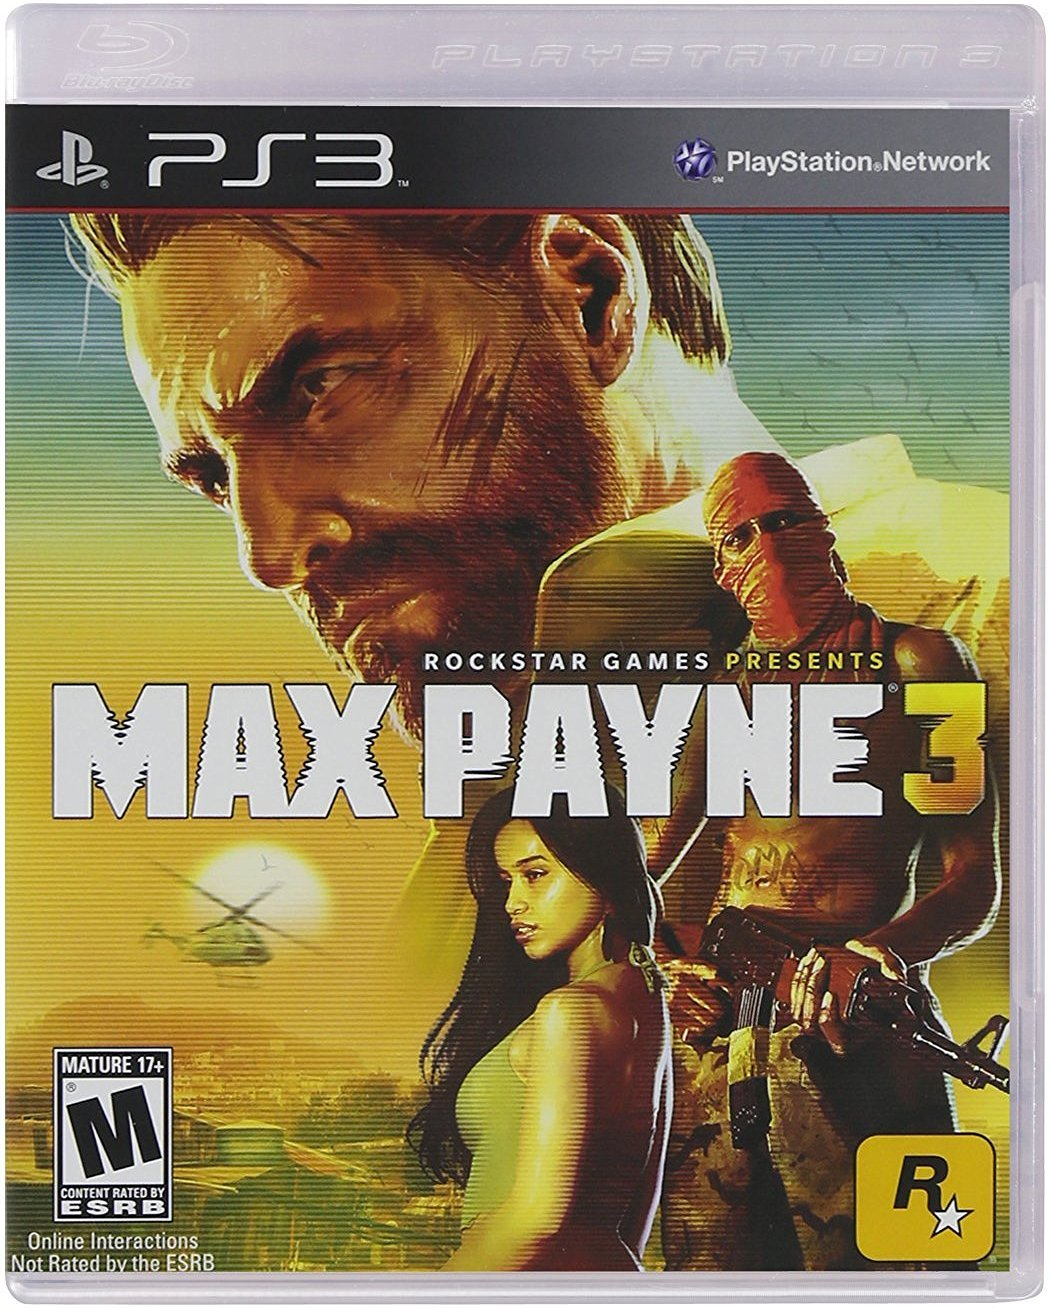 Matchmaking Max Payne 3